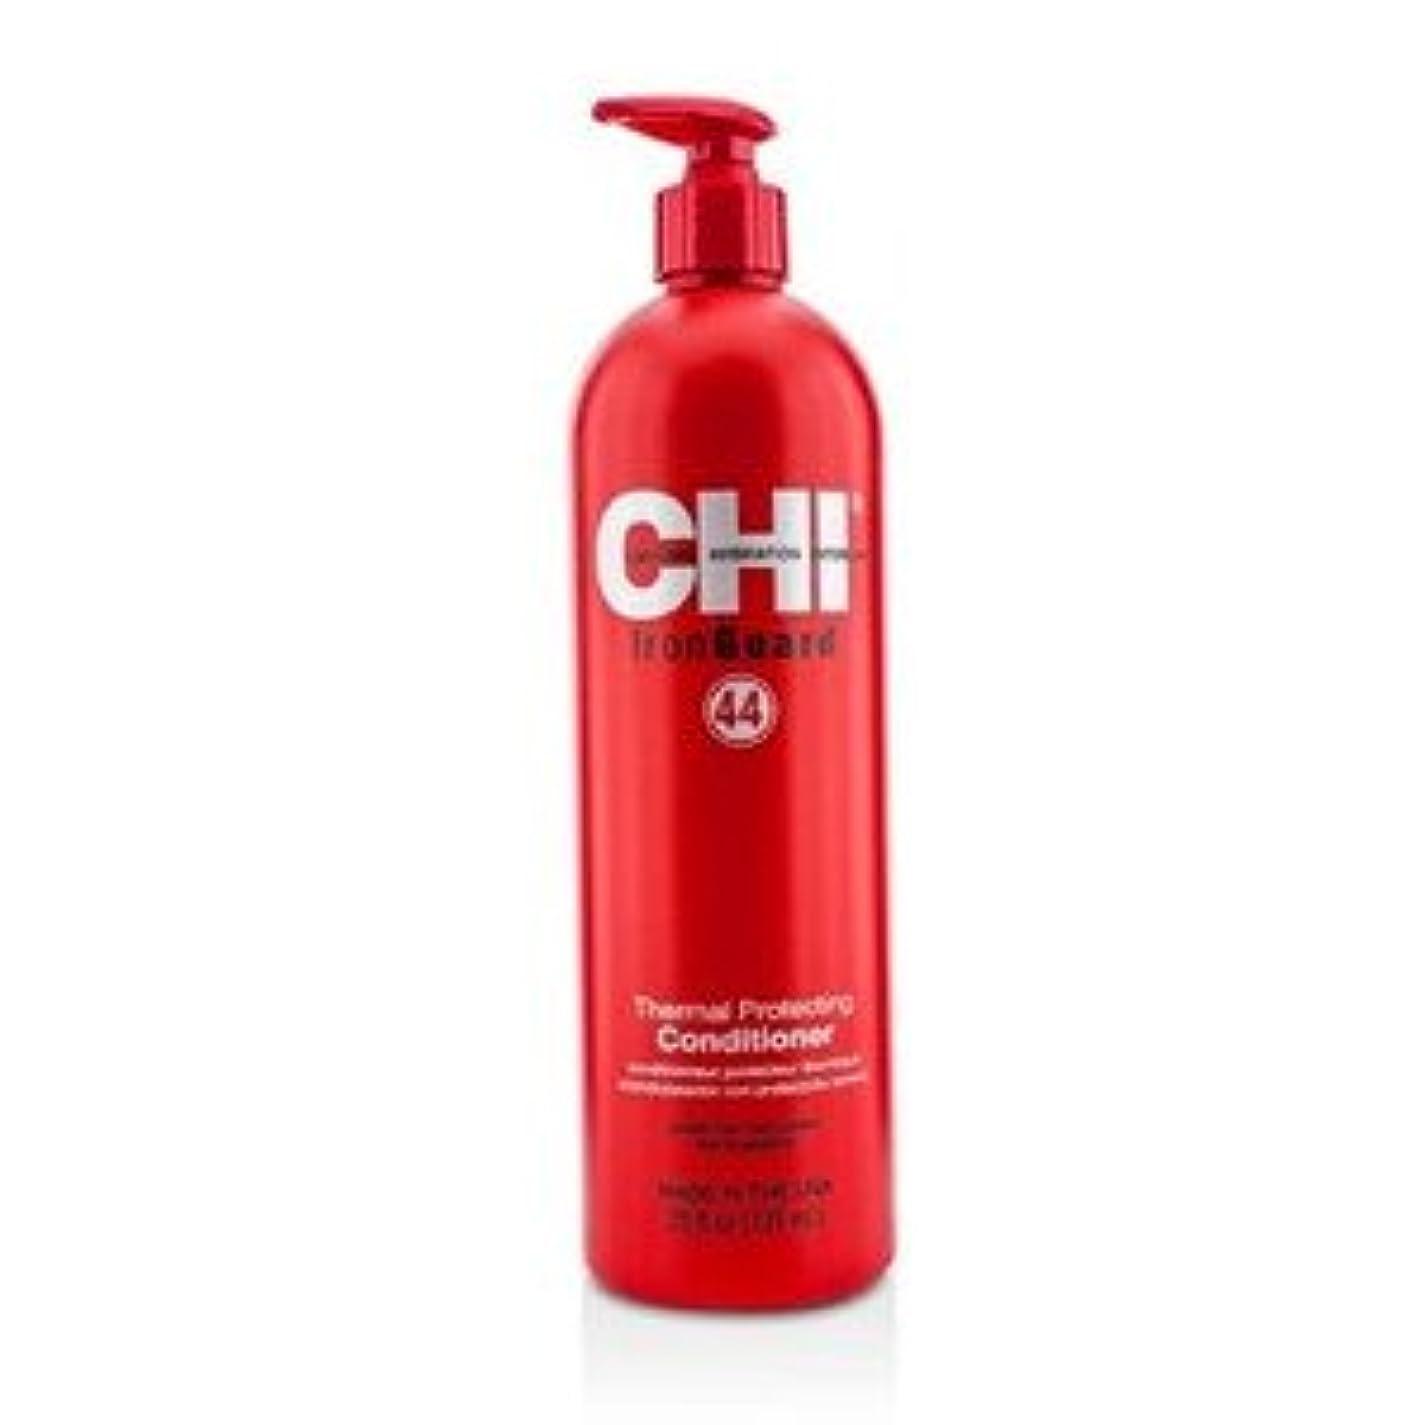 CHI CHI44 アイロン ガード サーマル プロテクティング コンディショナー 739ml/25oz [並行輸入品]